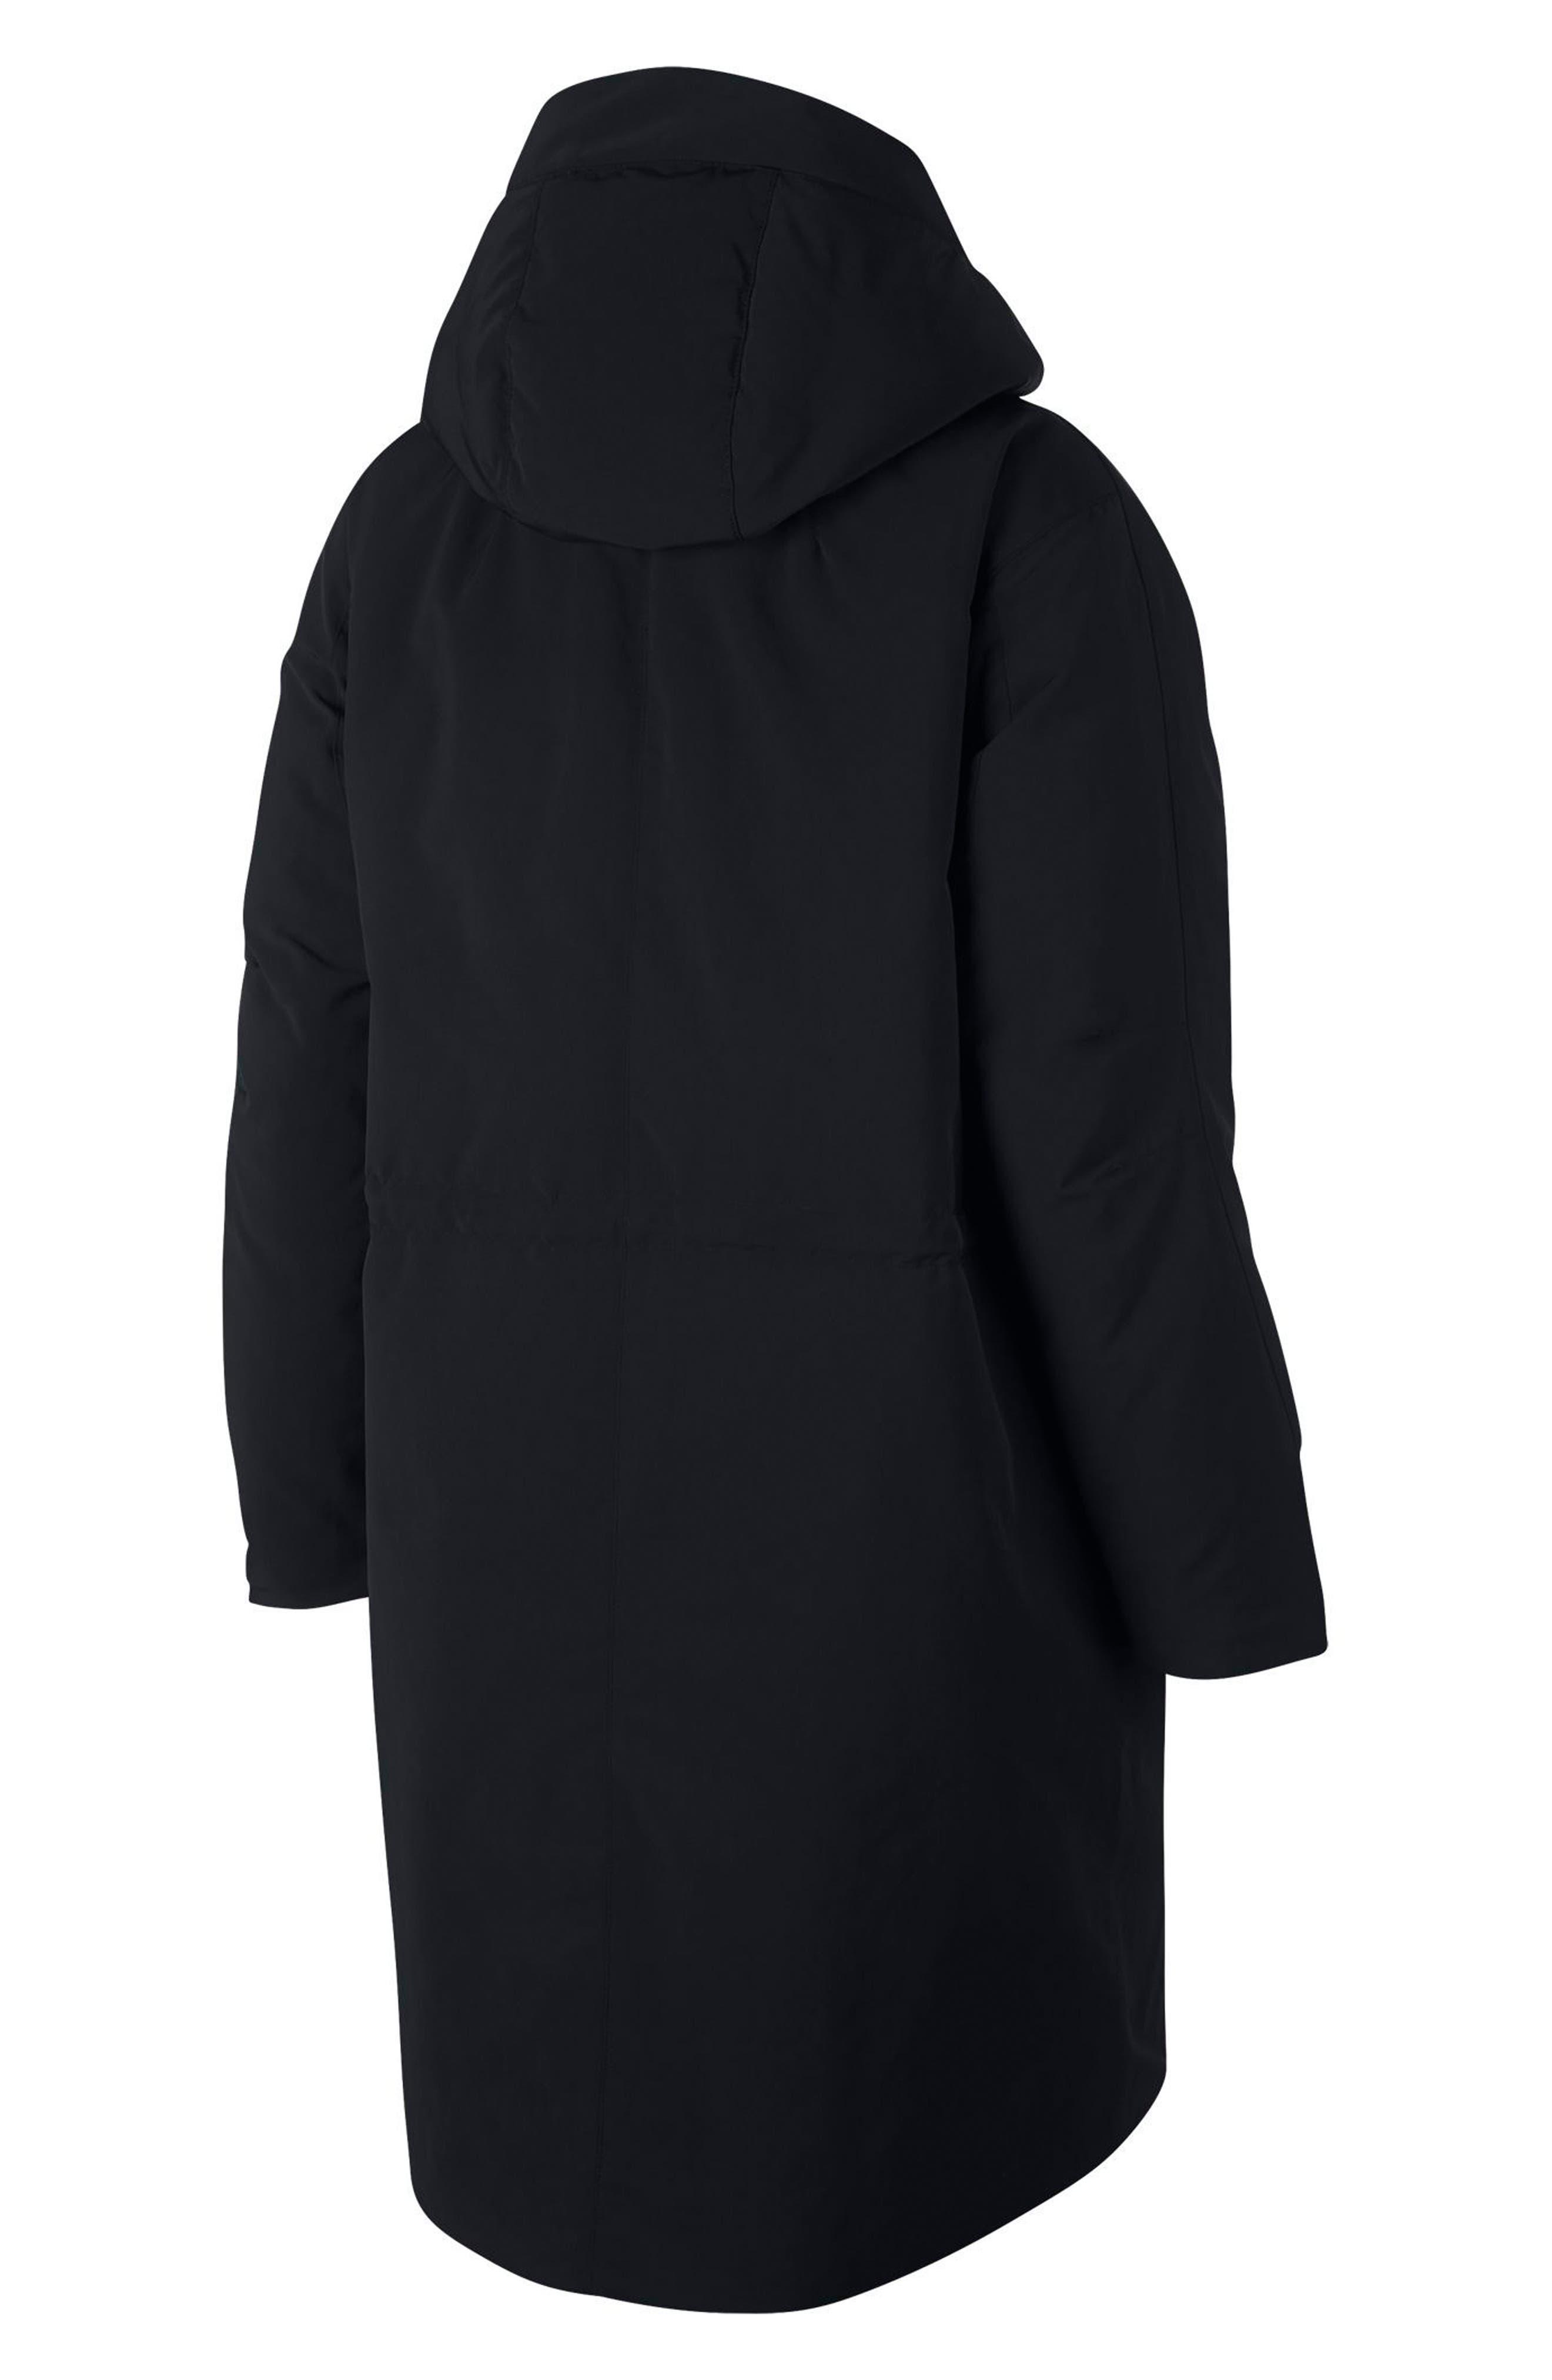 Sportswear Tech Pack Women's Down Fill Parka,                             Alternate thumbnail 7, color,                             BLACK/ NEWSPRINT/ BLACK